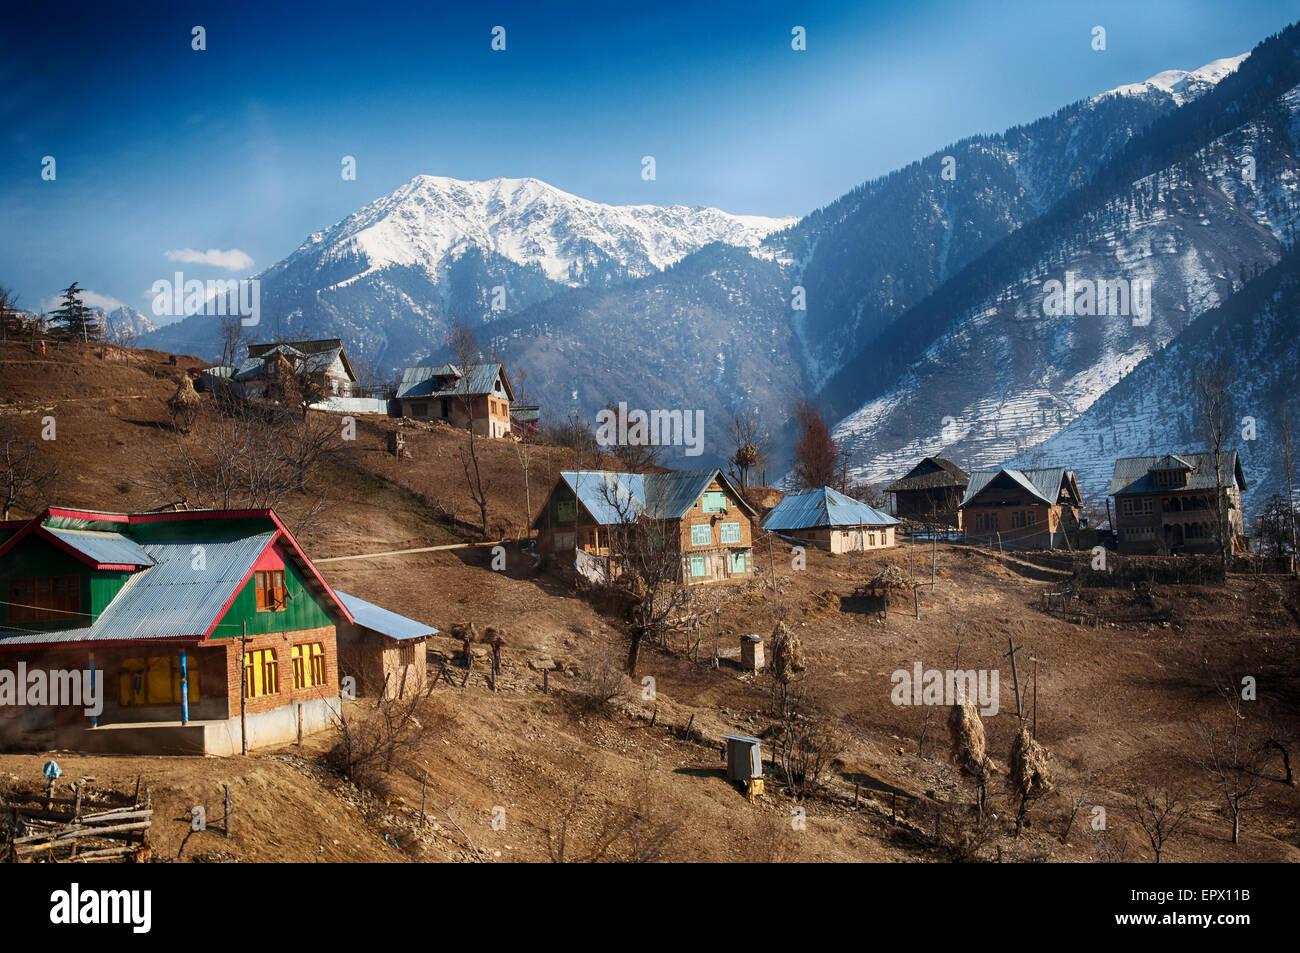 Kashmir Houses Pictures